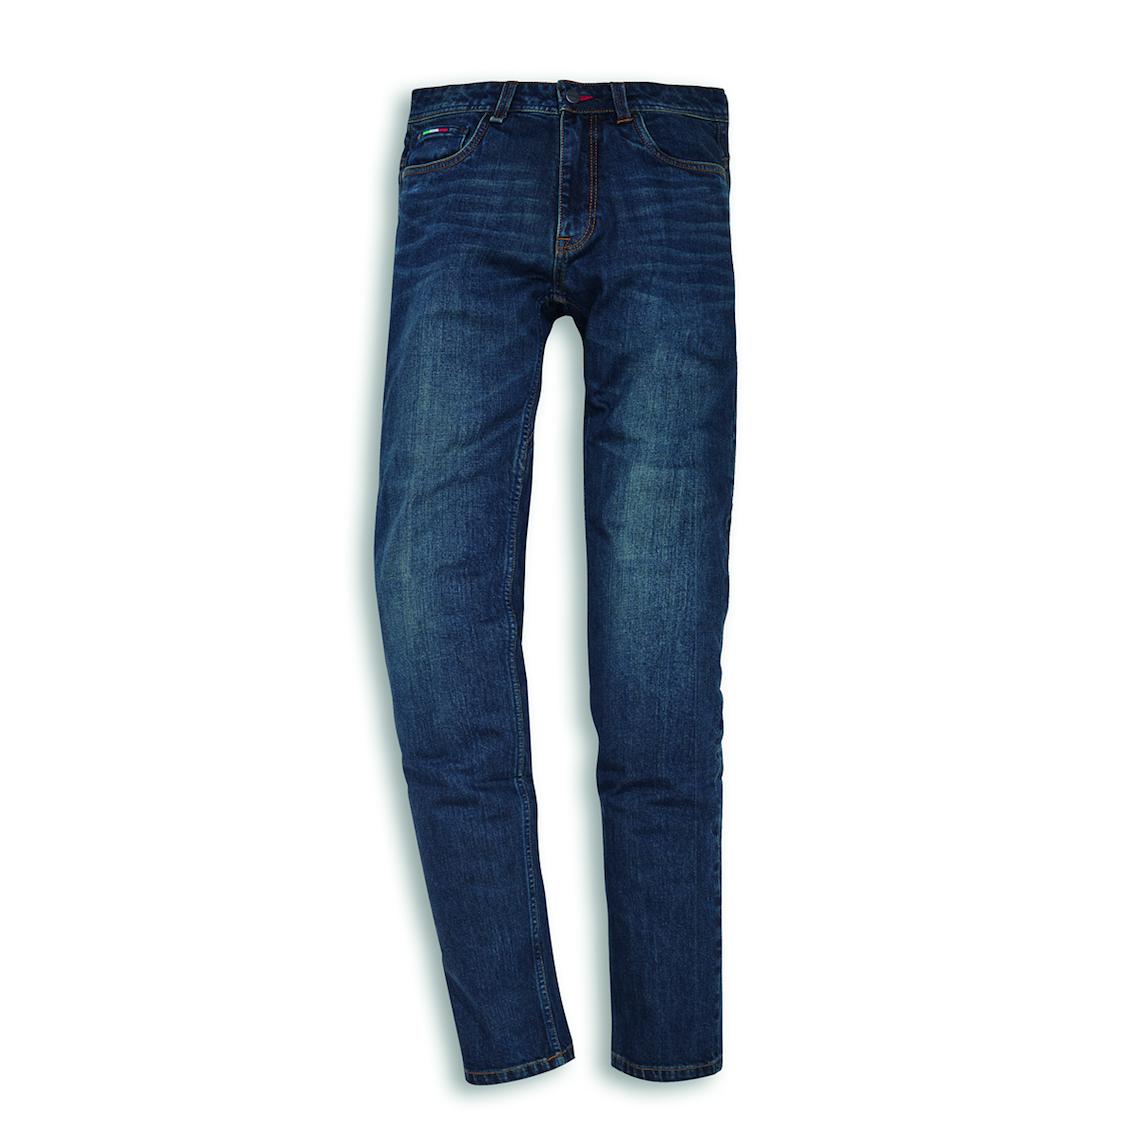 Ducati-Company-C3-Technical-Jeans